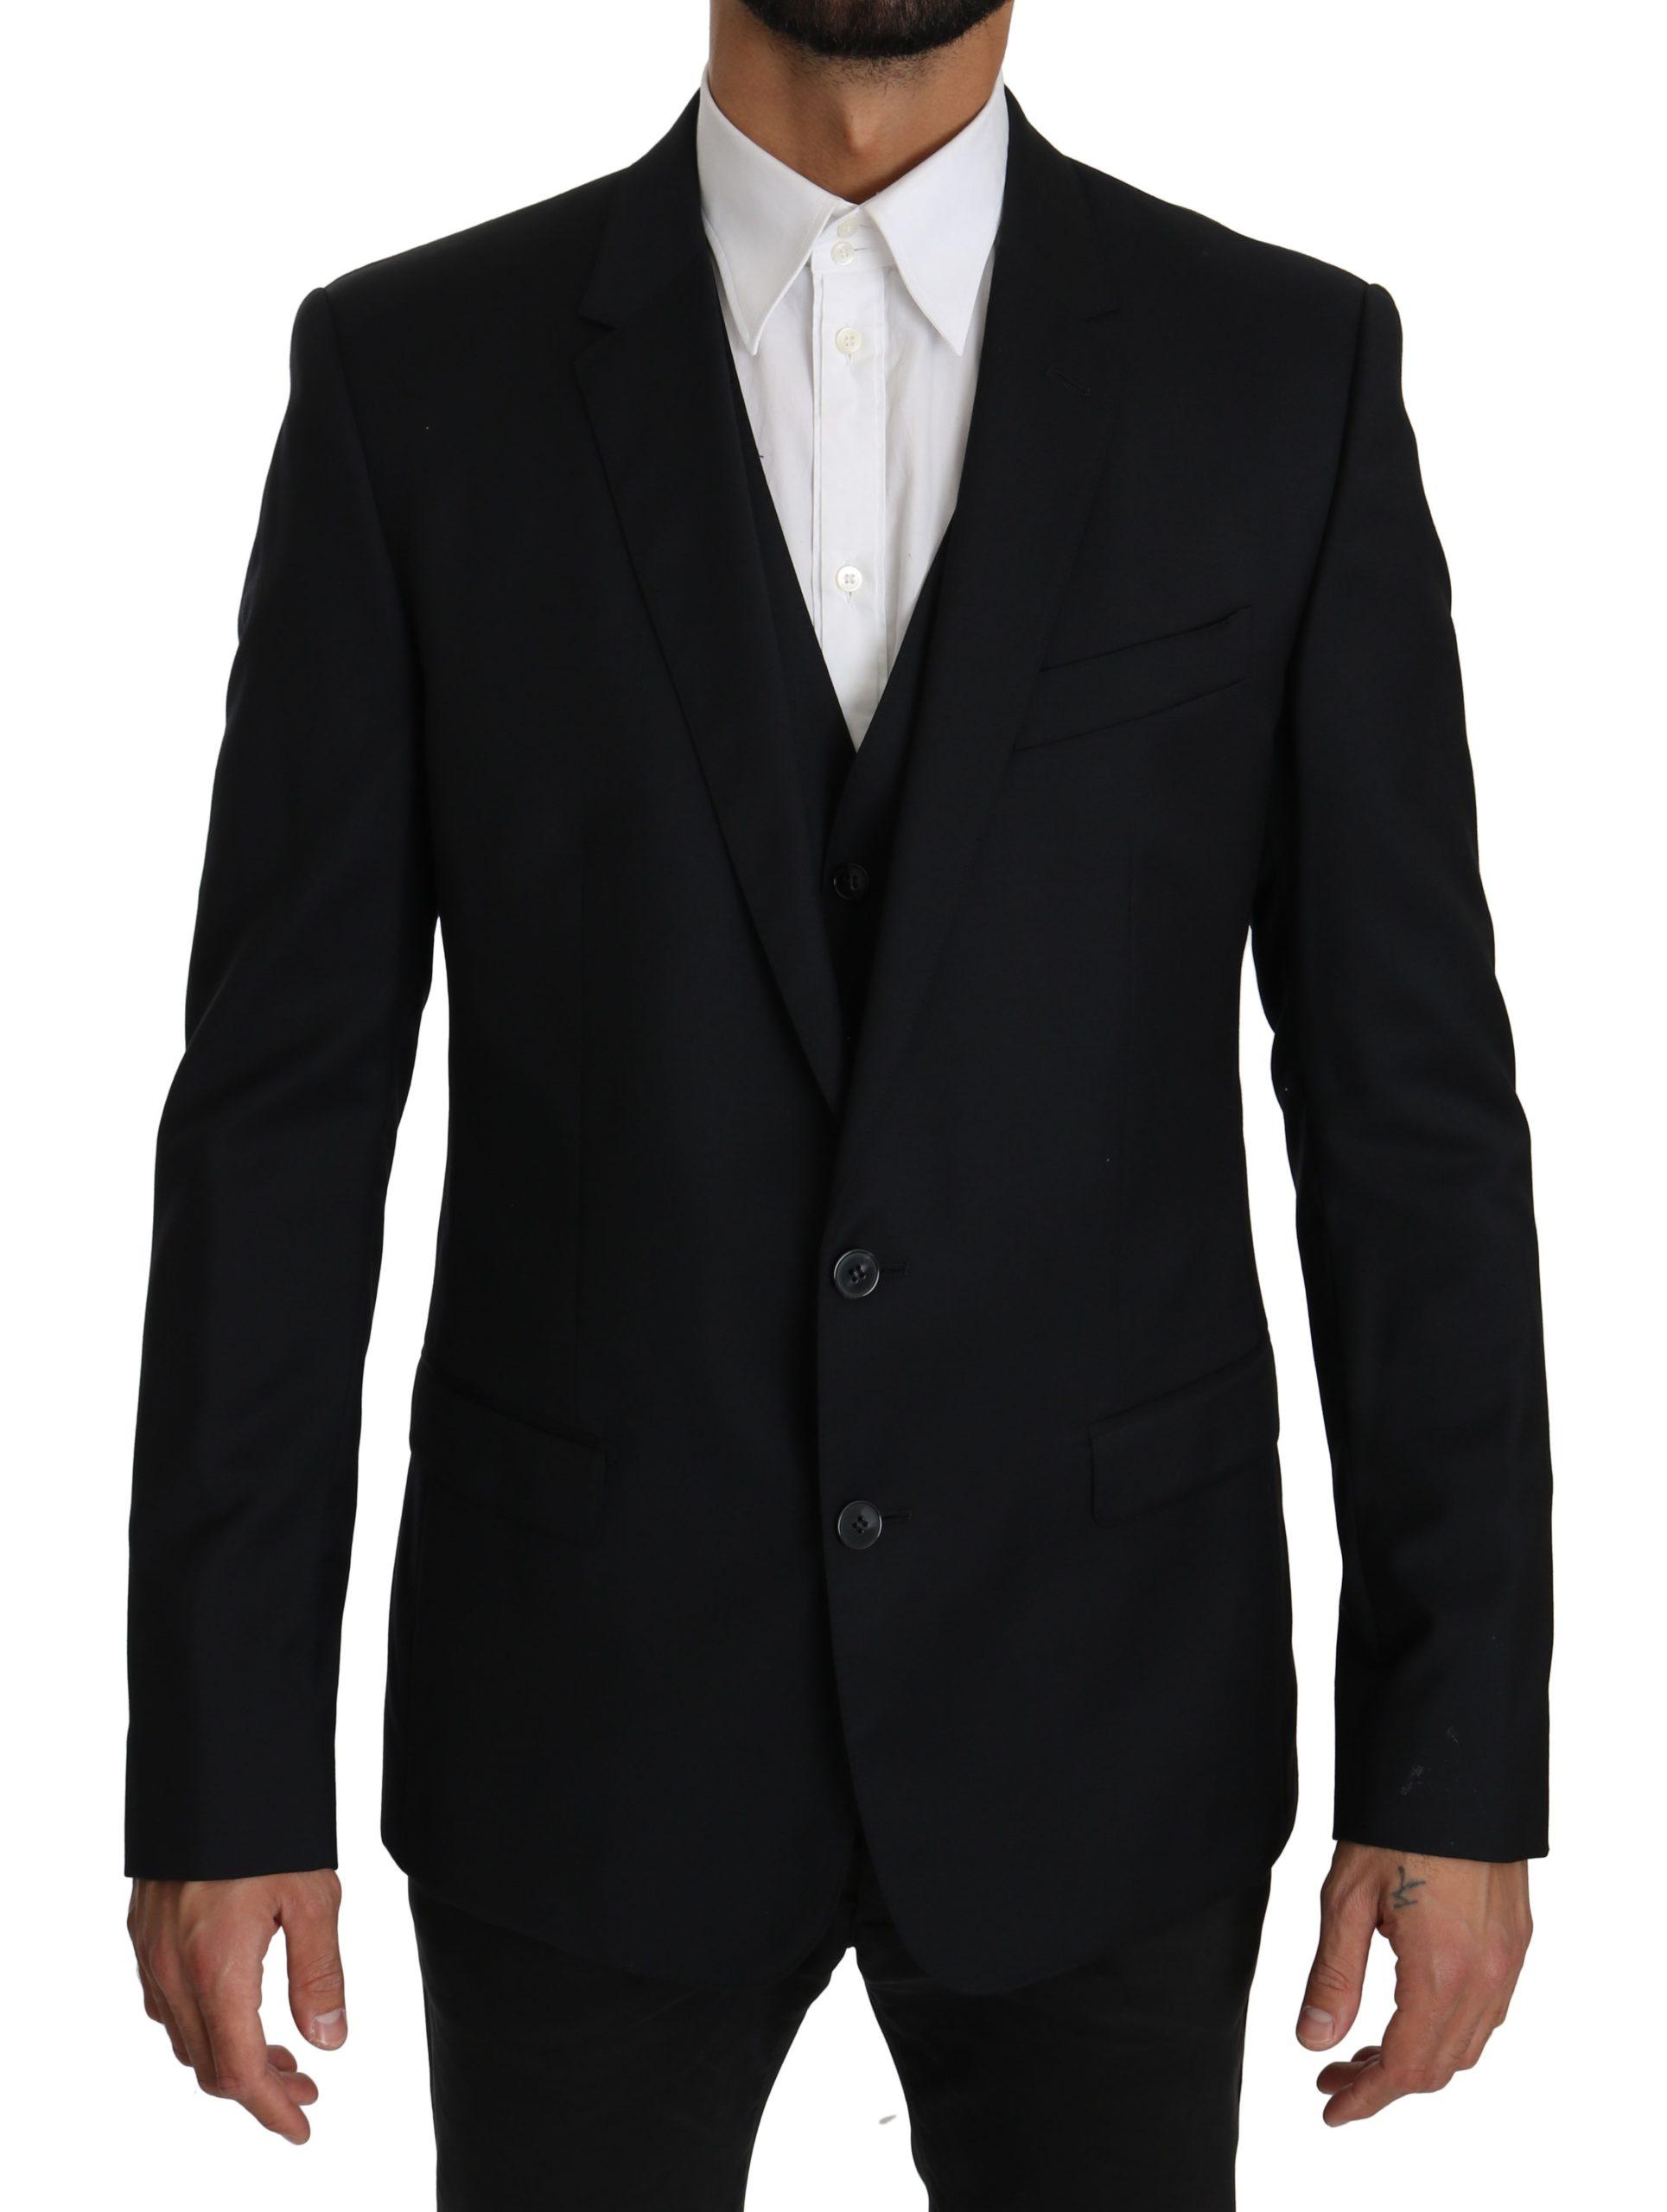 Dolce & Gabbana Men's Two Piece Vest Jacket MARTINI Blazer Blue KOS1602 - IT50 | L